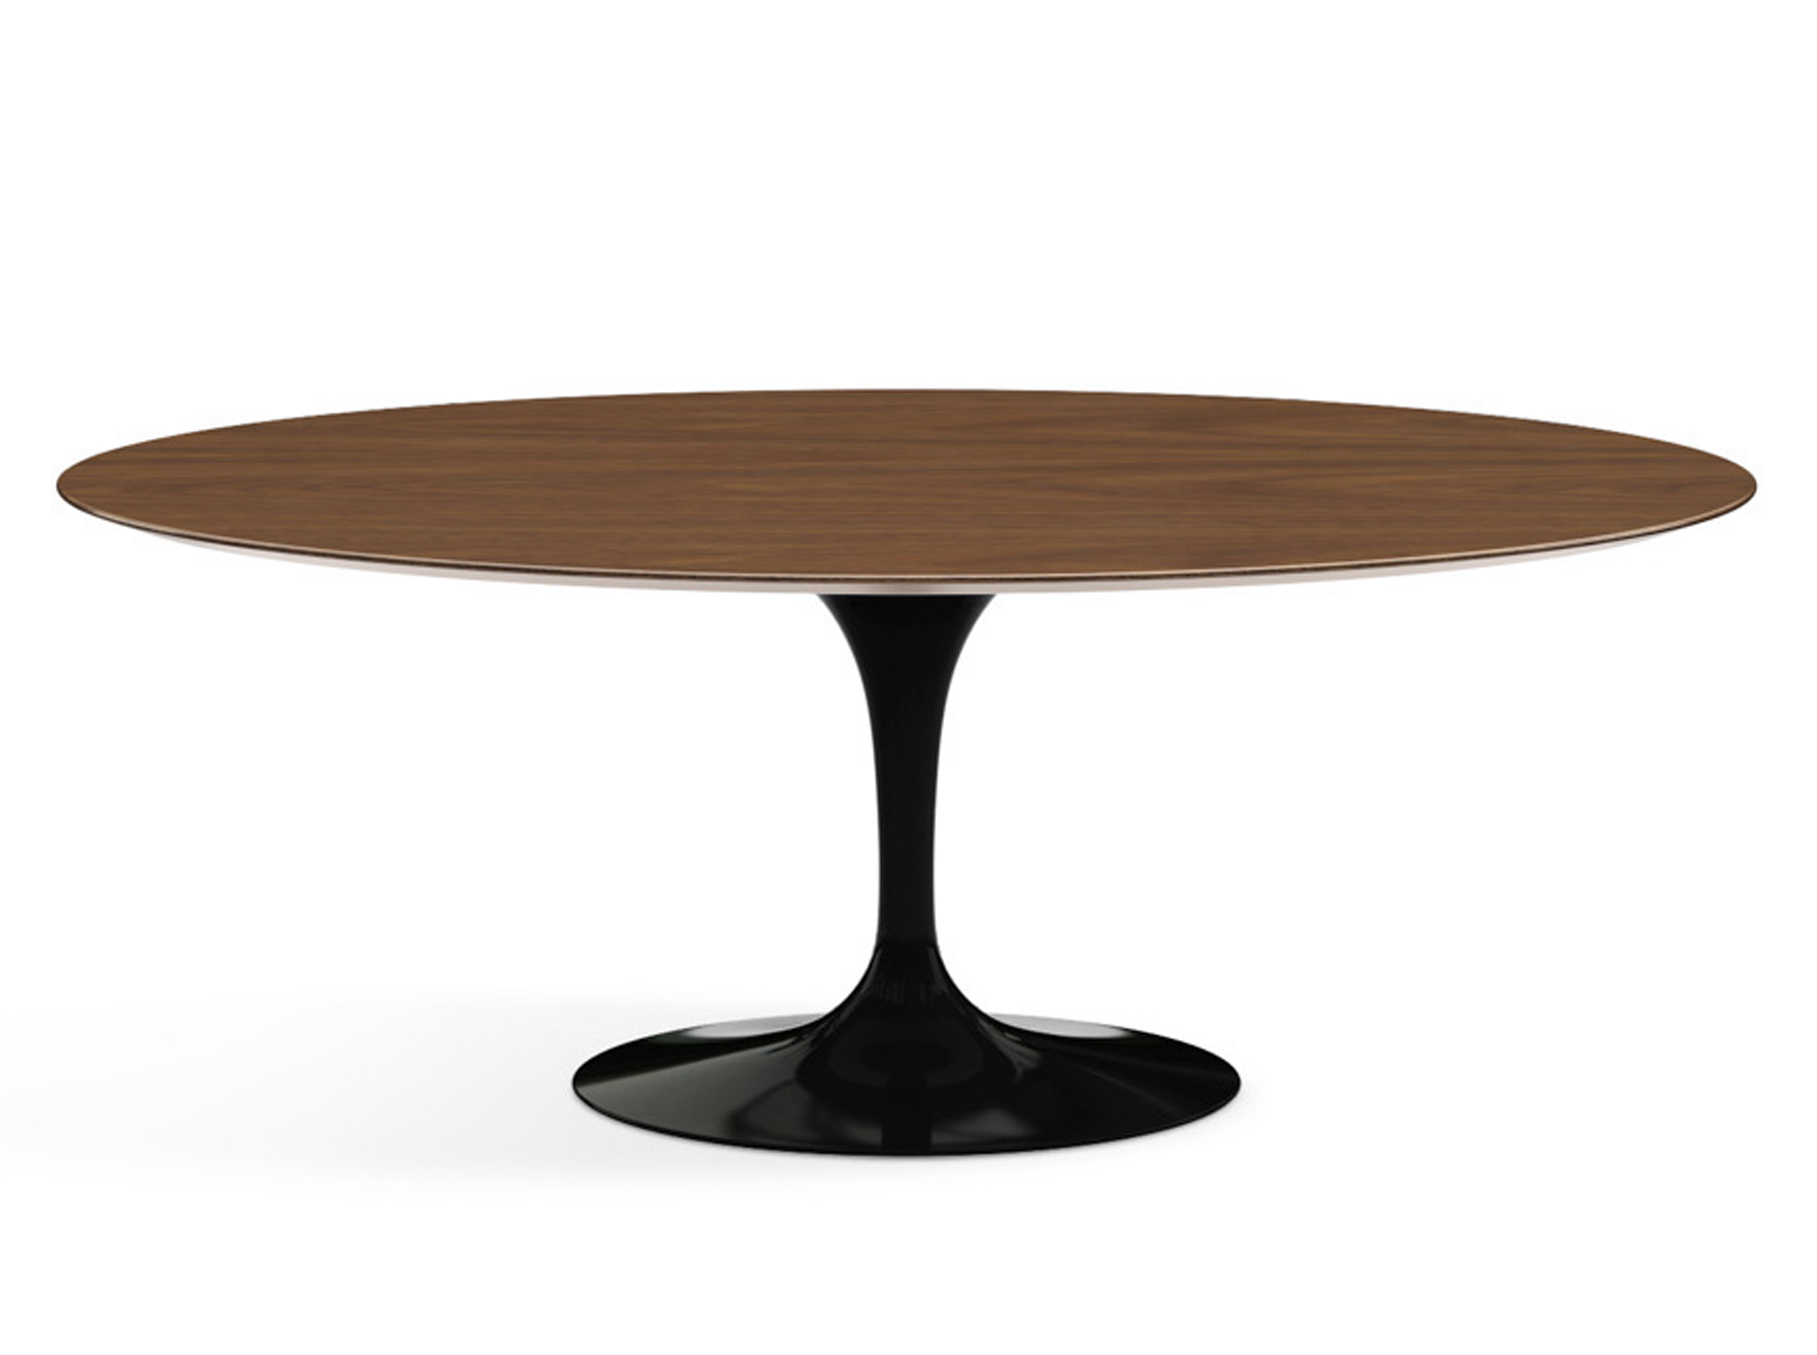 Кухонный стол ActualDesign 9981499 от thefurnish